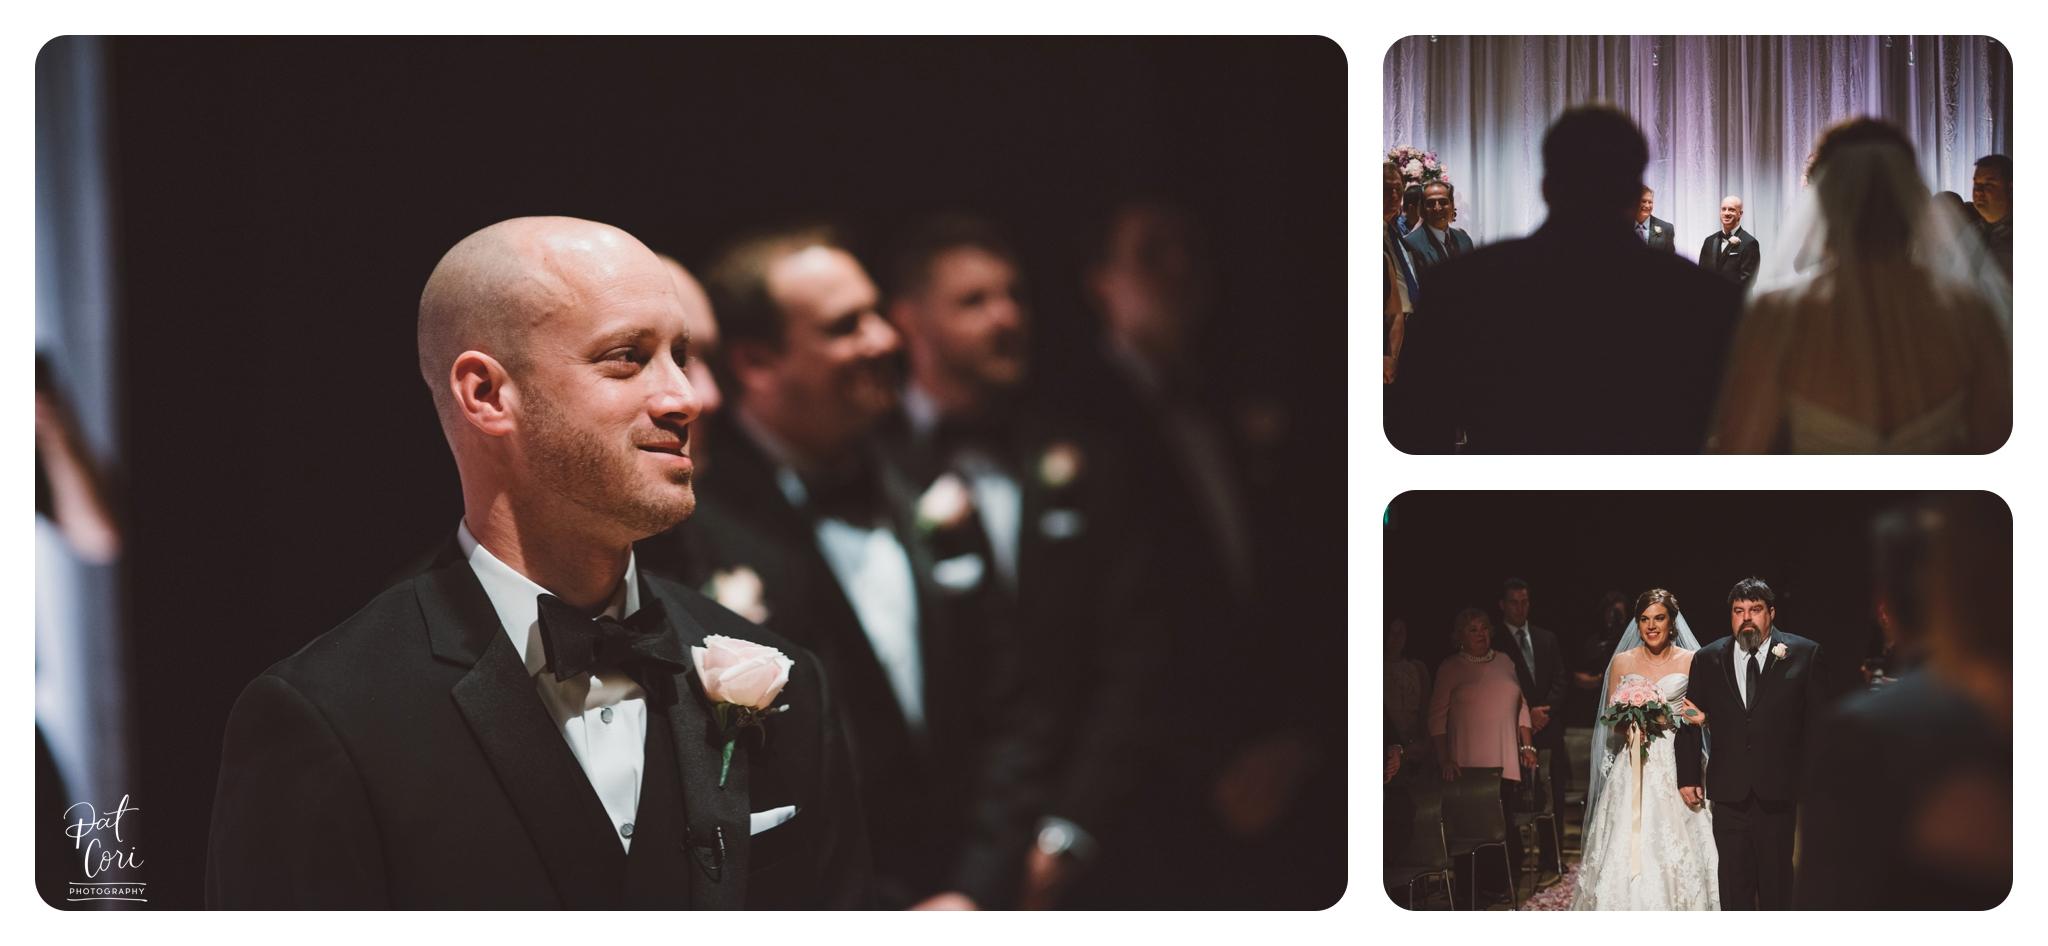 Center-in-the-Square-_-Weddings-Wedding-Photographer-Virginia-022.jpg